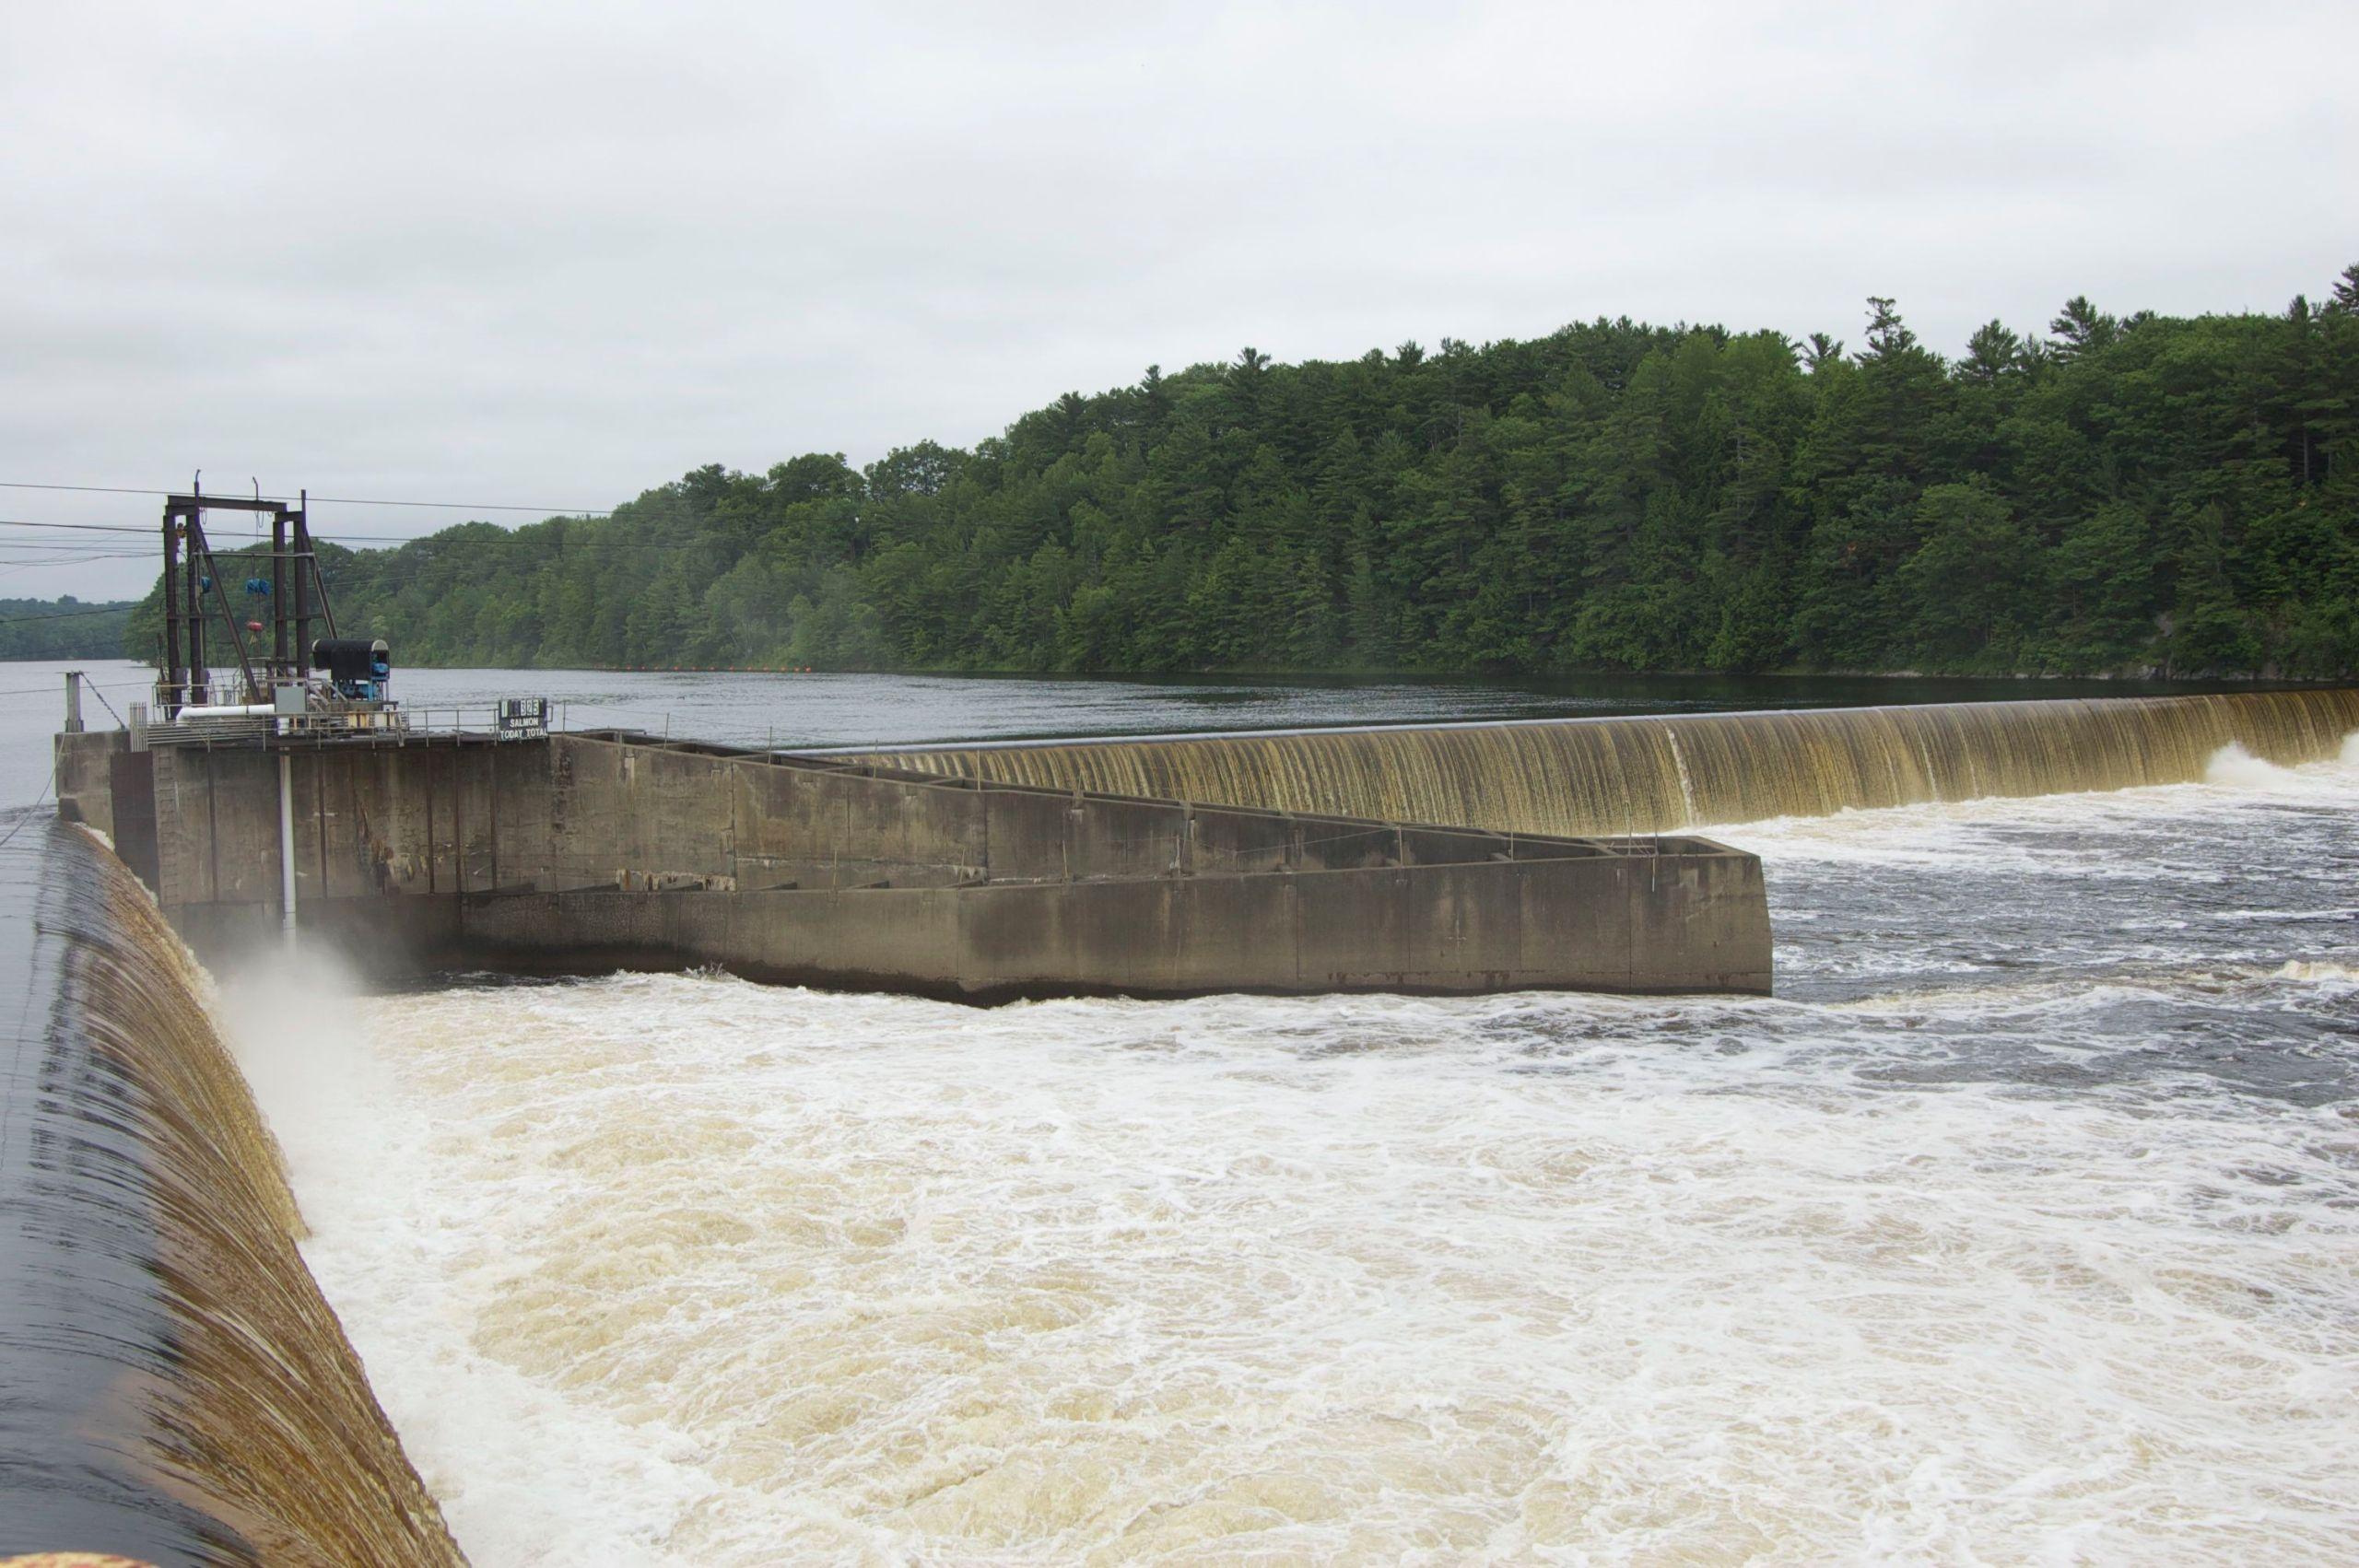 Photo of Veazie Dam from Penobscot River Restoration Trust, http://flic.kr/p/f6Aoum